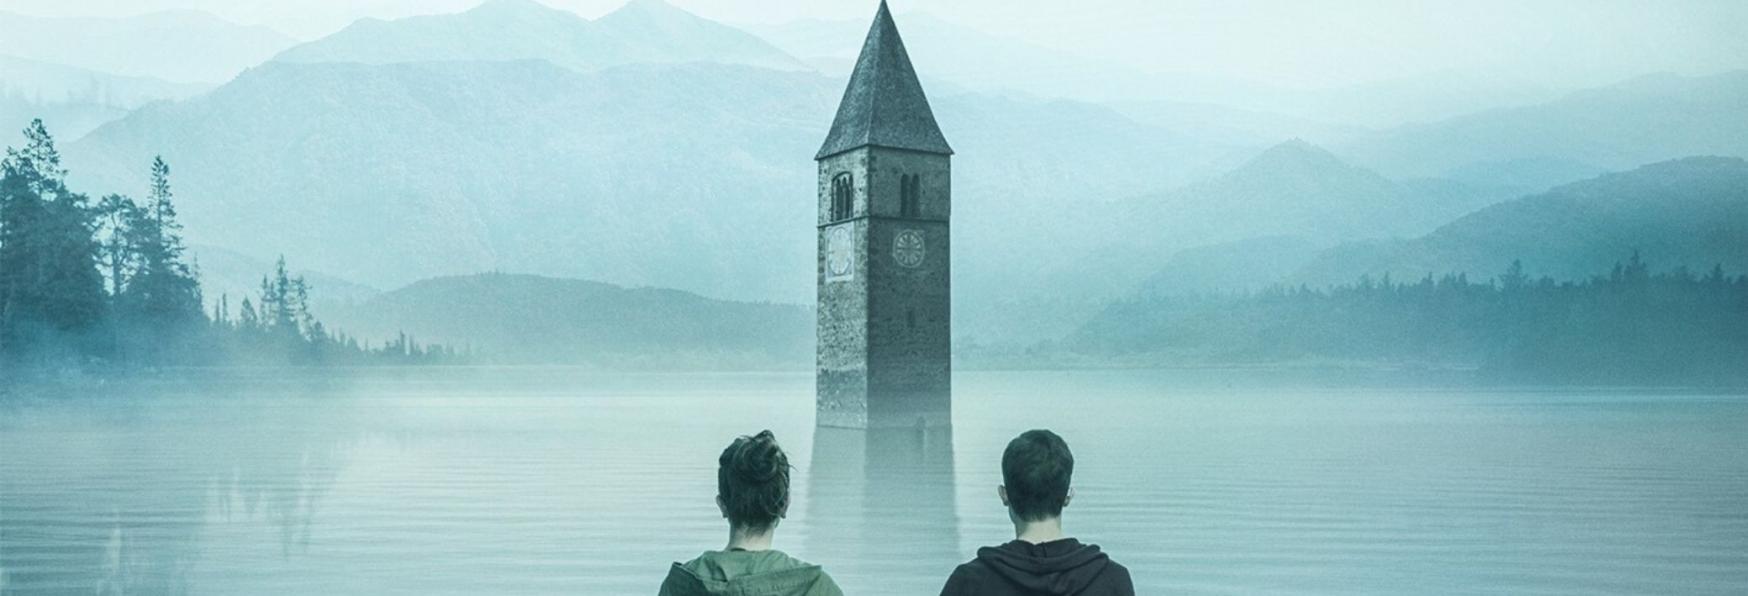 Curon: svelata la Data di Uscita della nuova Serie TV targata Netflix